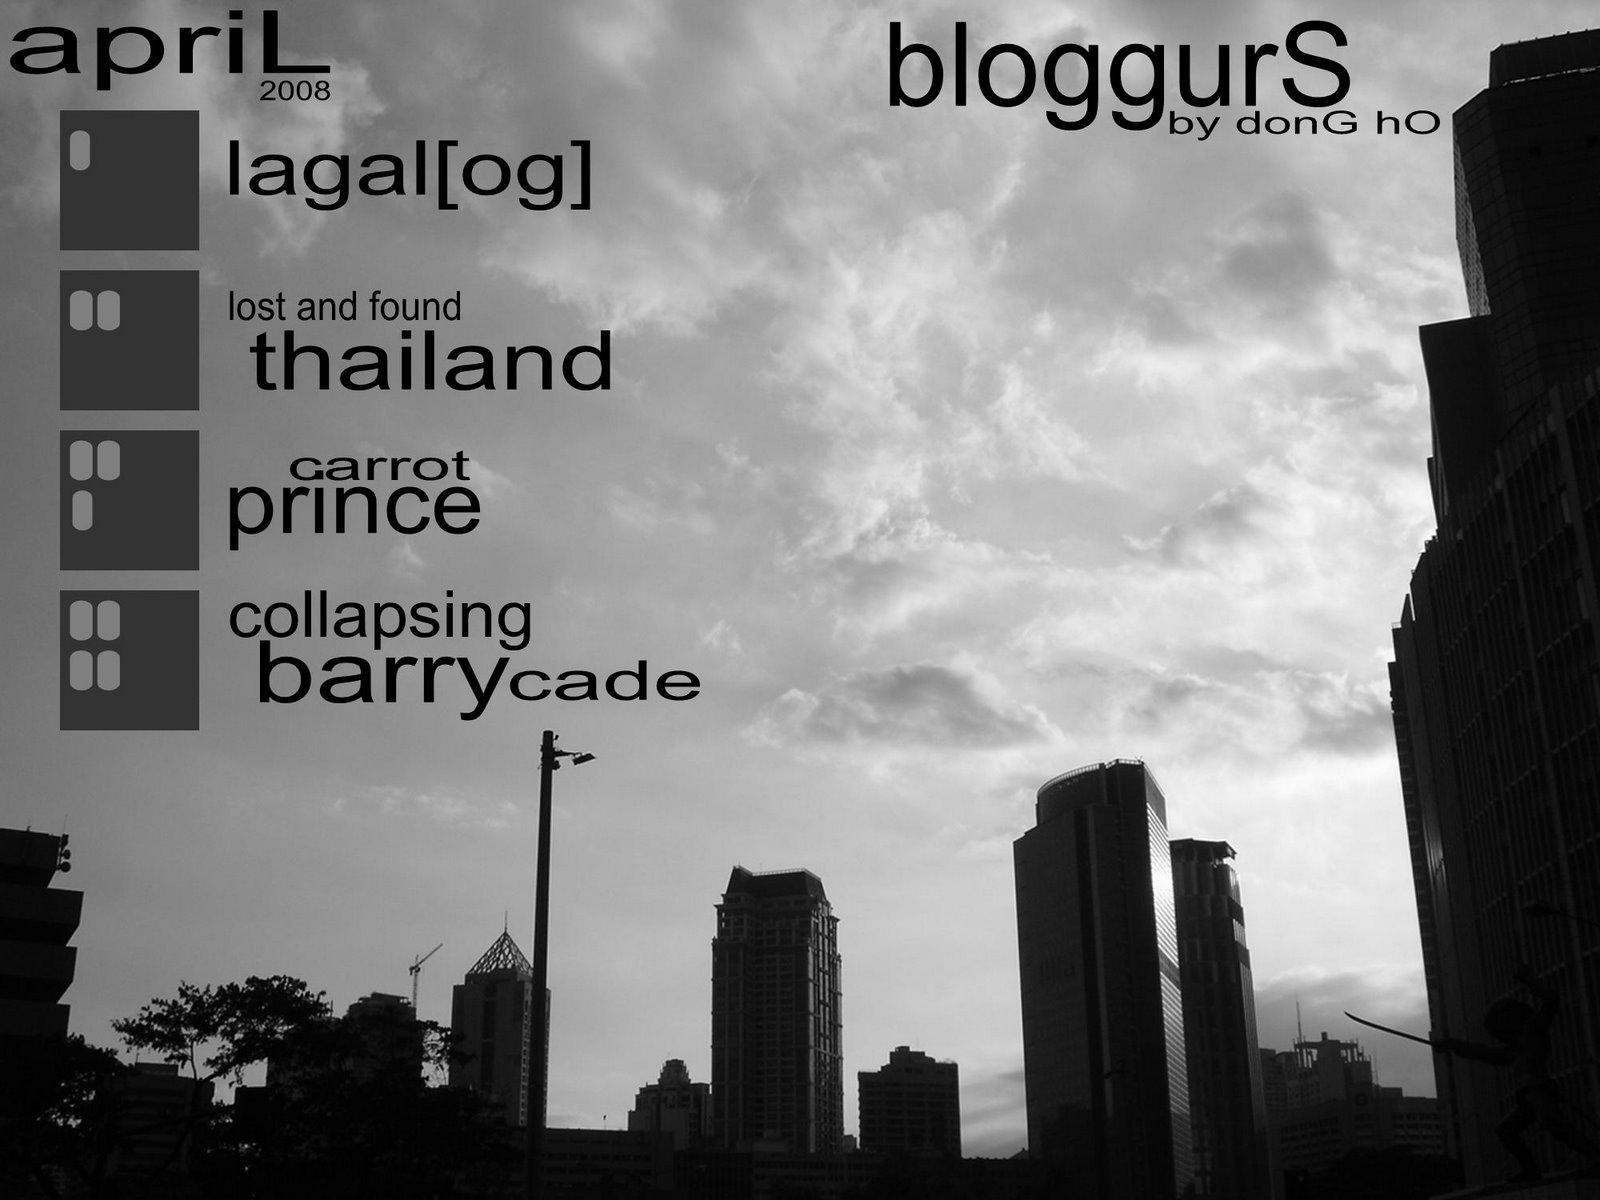 bloggurs